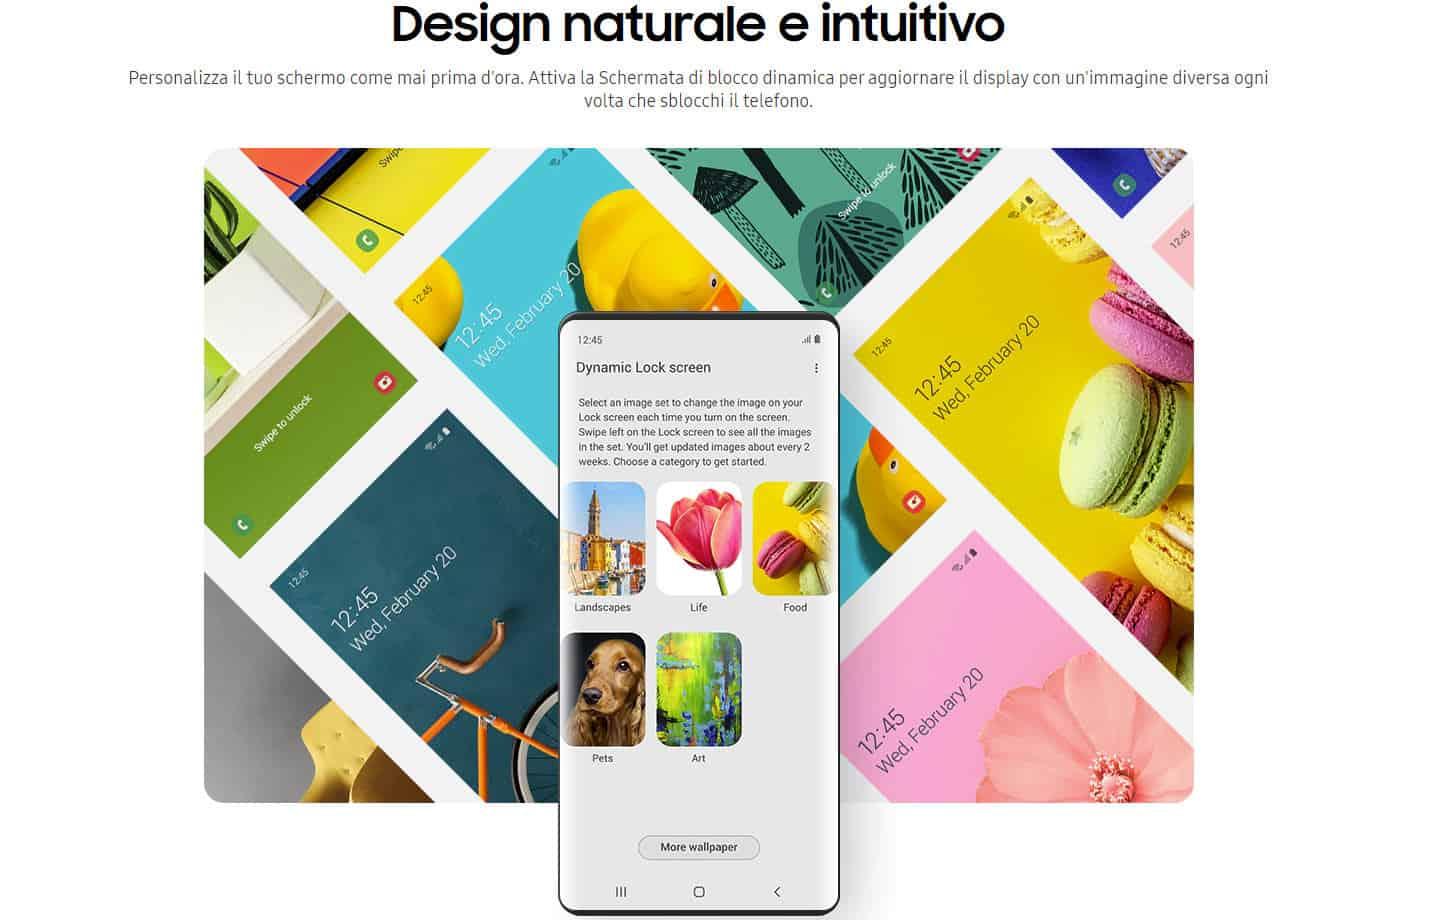 miglior smartphone Samsung One UI